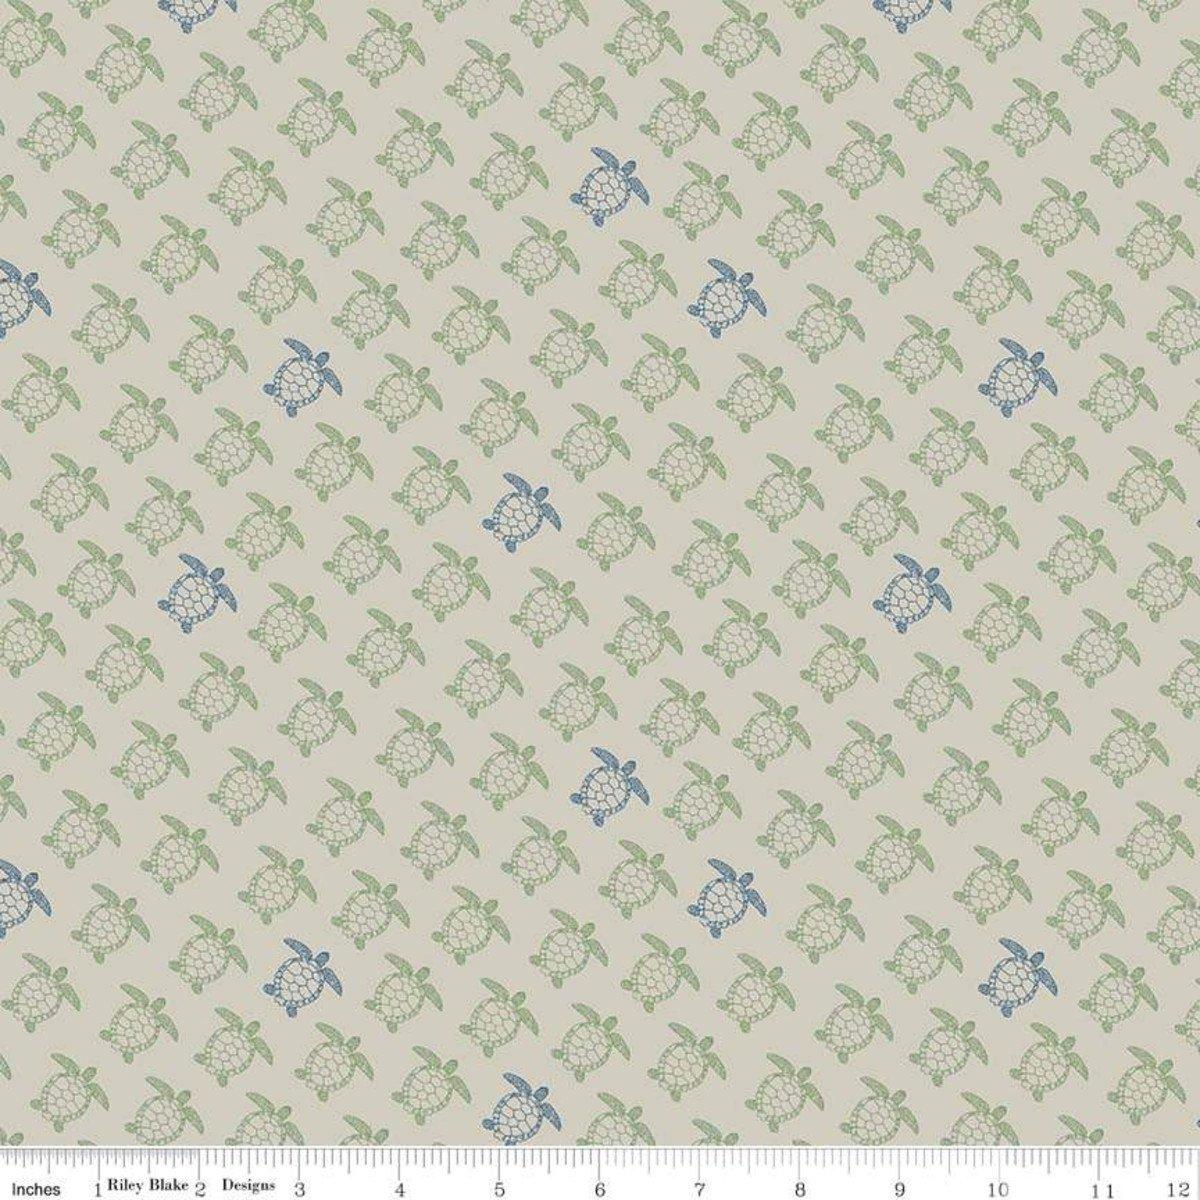 Offshore 2 Turtle Tan Fabric by Riley Blake C7985-TAN